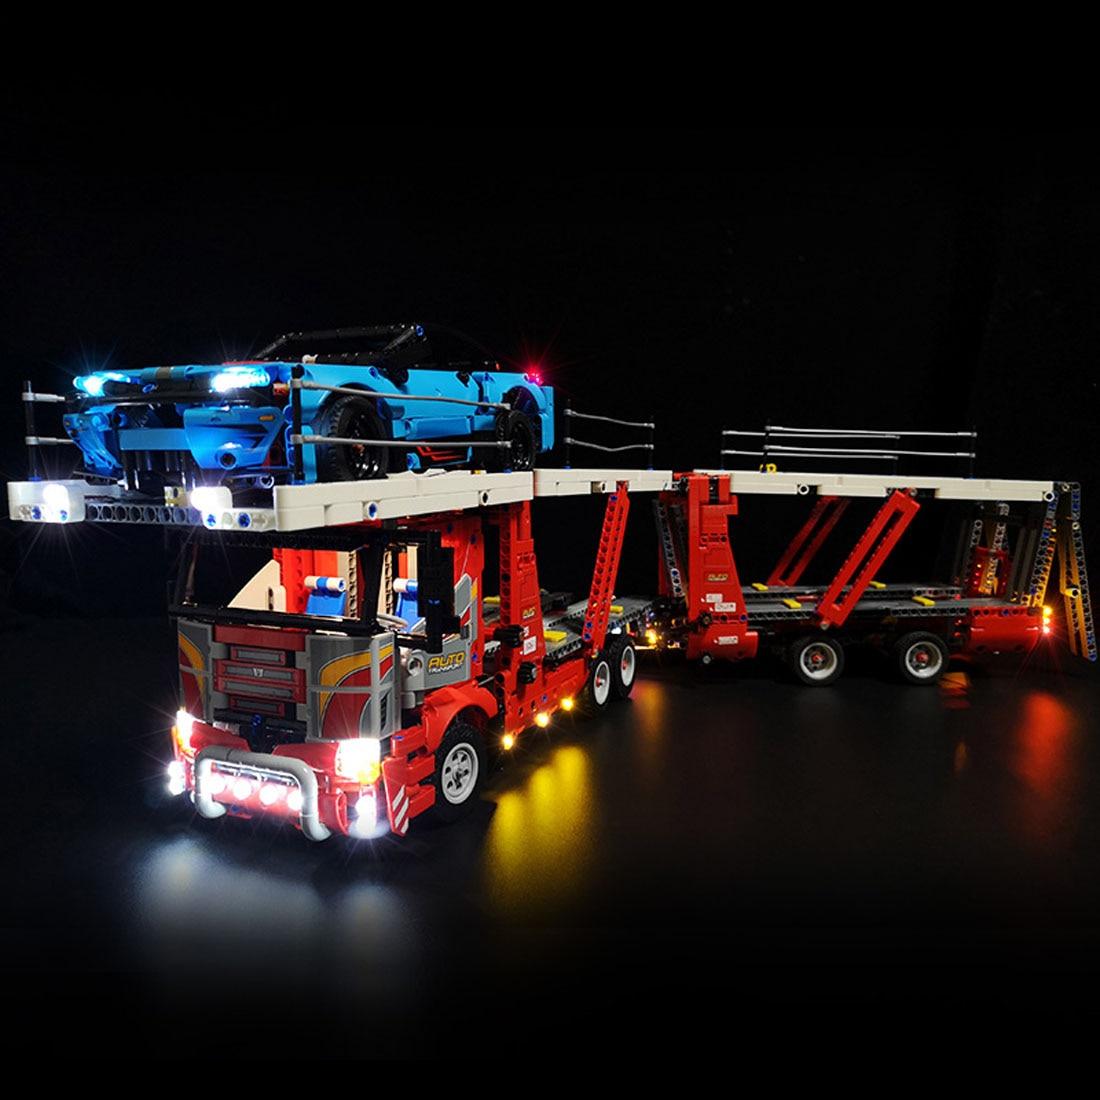 USB Powered LED Lighting Kit For Car Transporter 42098 Model Block Gift Toy (LED Included Only, No Kit)